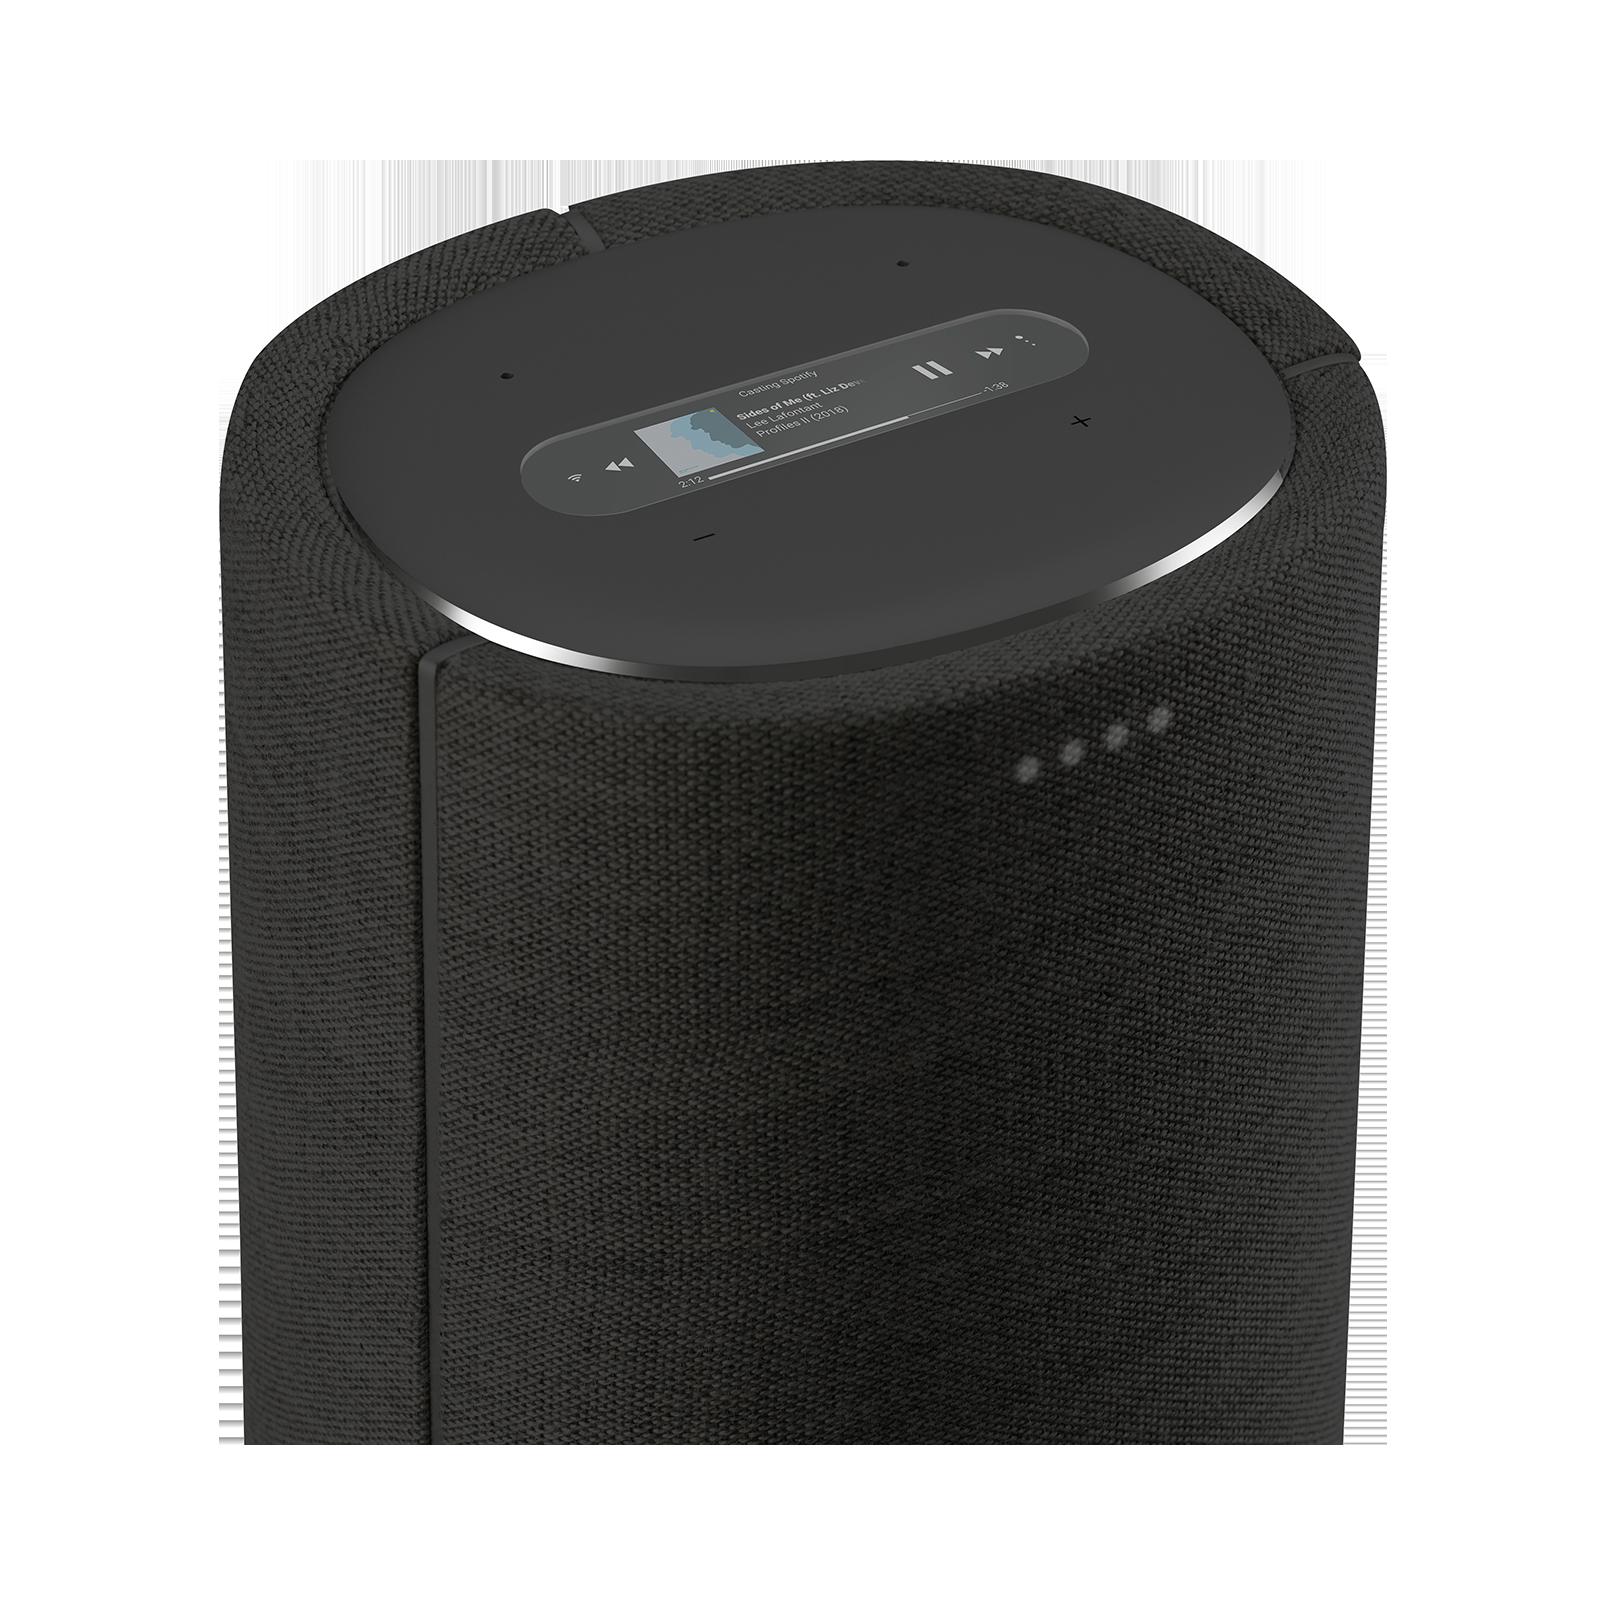 Harman Kardon Citation Tower - Black - Smart Premium Floorstanding Speaker that delivers an impactful performance - Detailshot 1